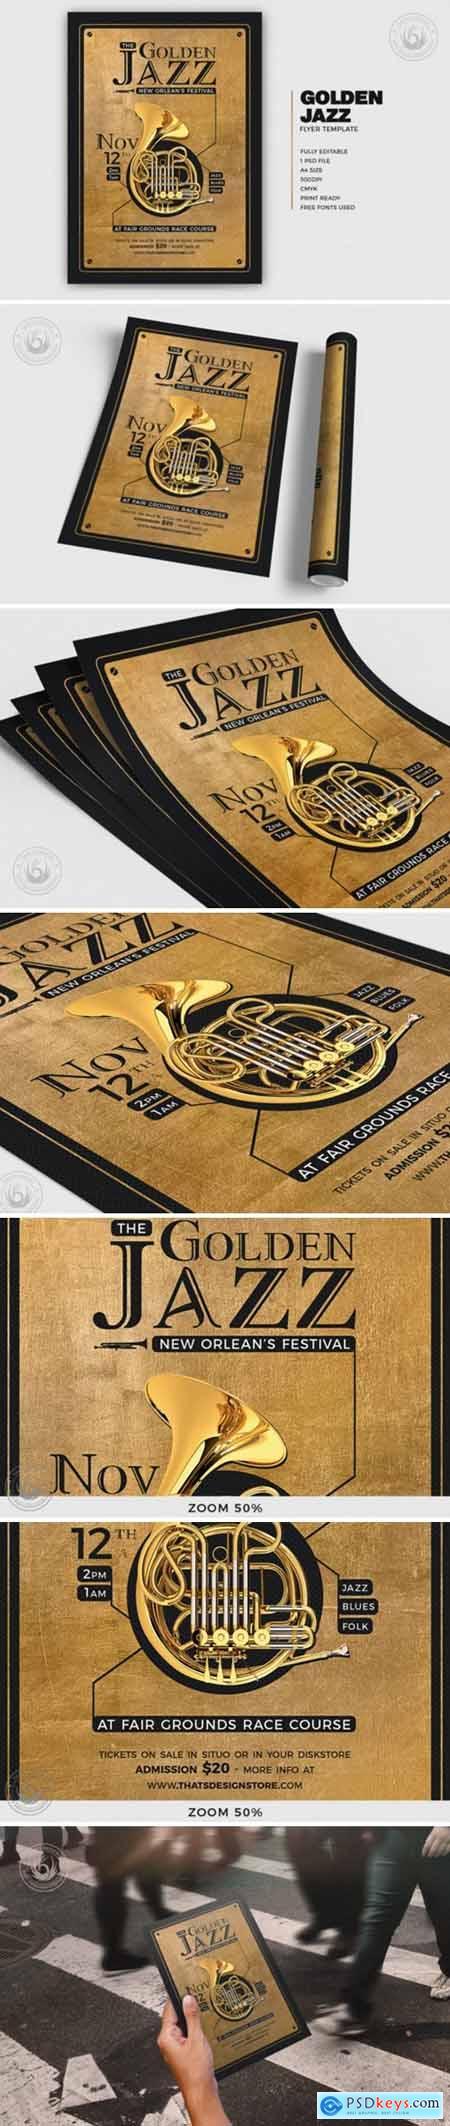 Golden Jazz Flyer Template V4 4164206